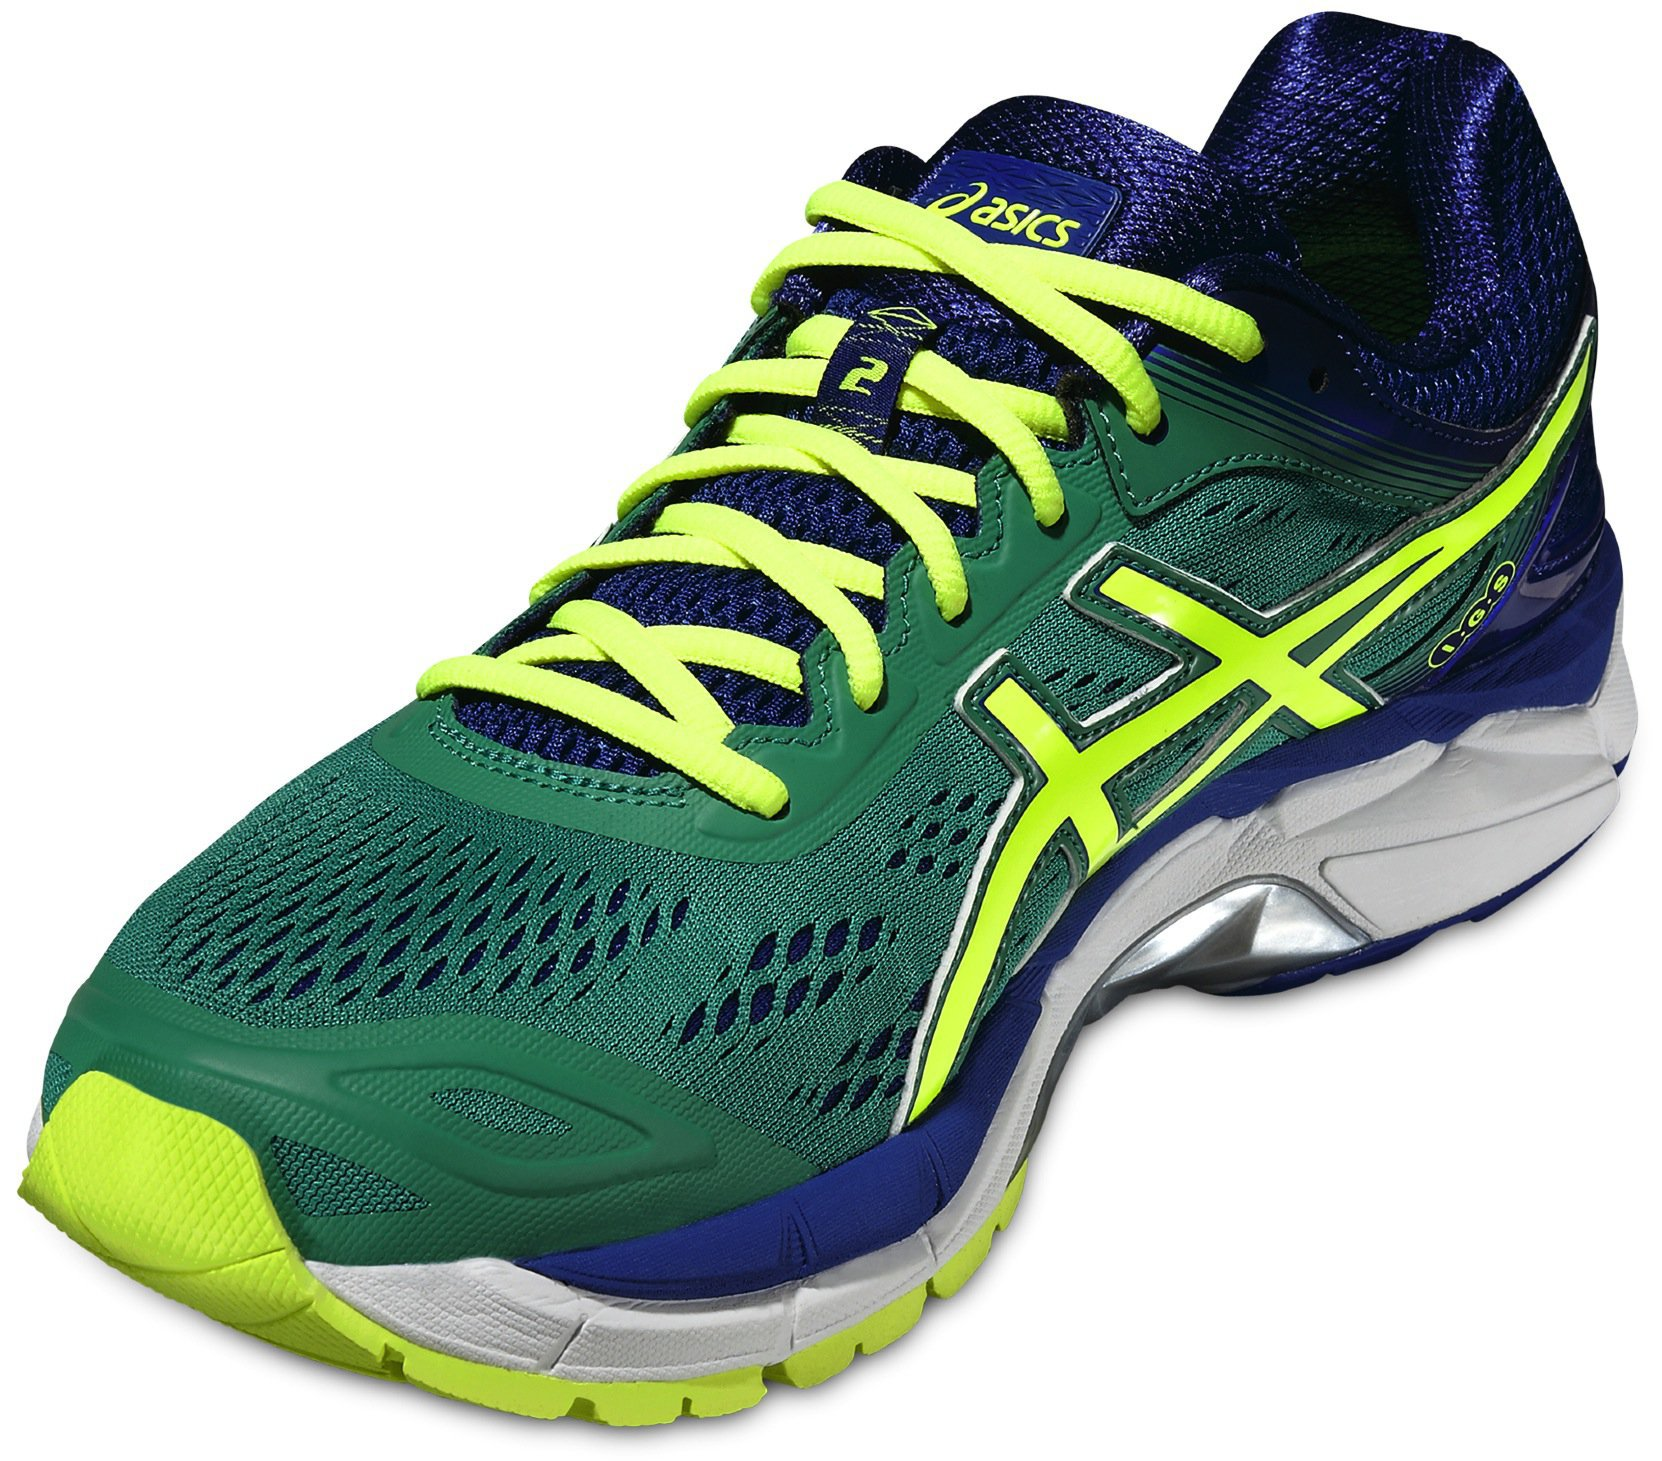 Мужская беговая обувь Asics Gel-Pursue 2 (T5D0N 8807) фото